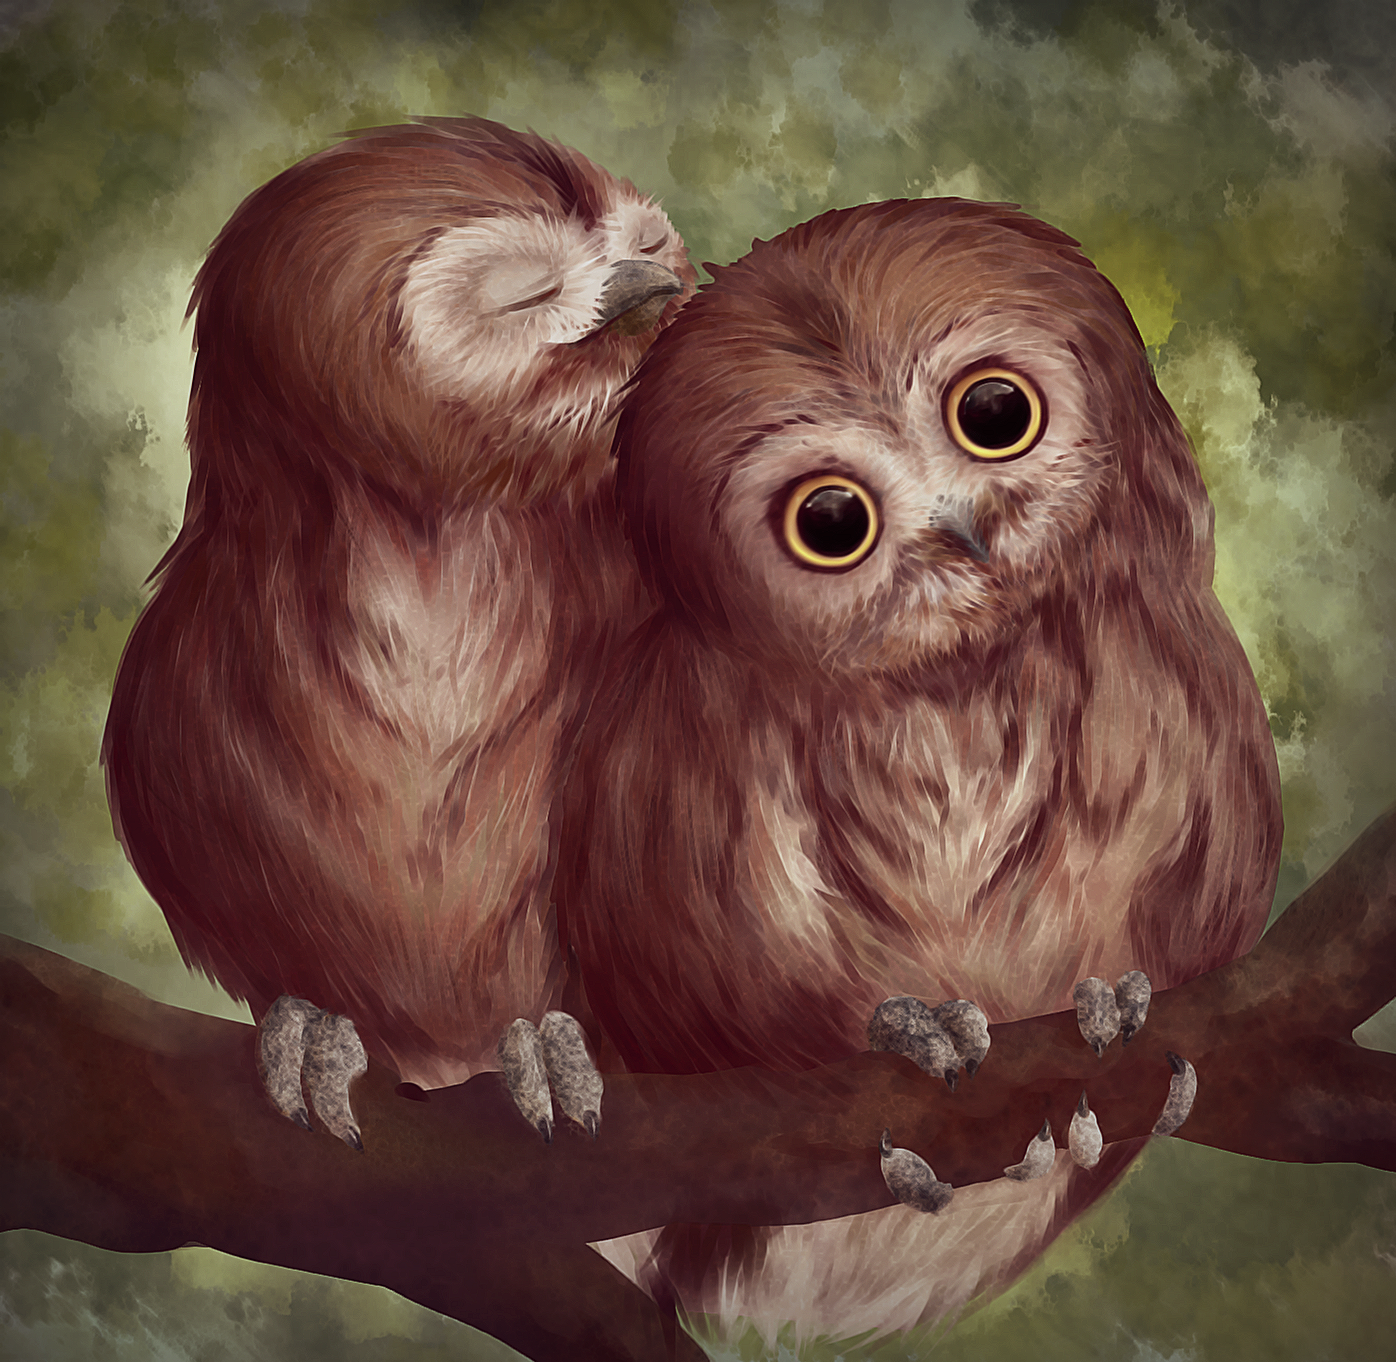 Drawing Practice: Cuddling owls by Kawaii-Fruit